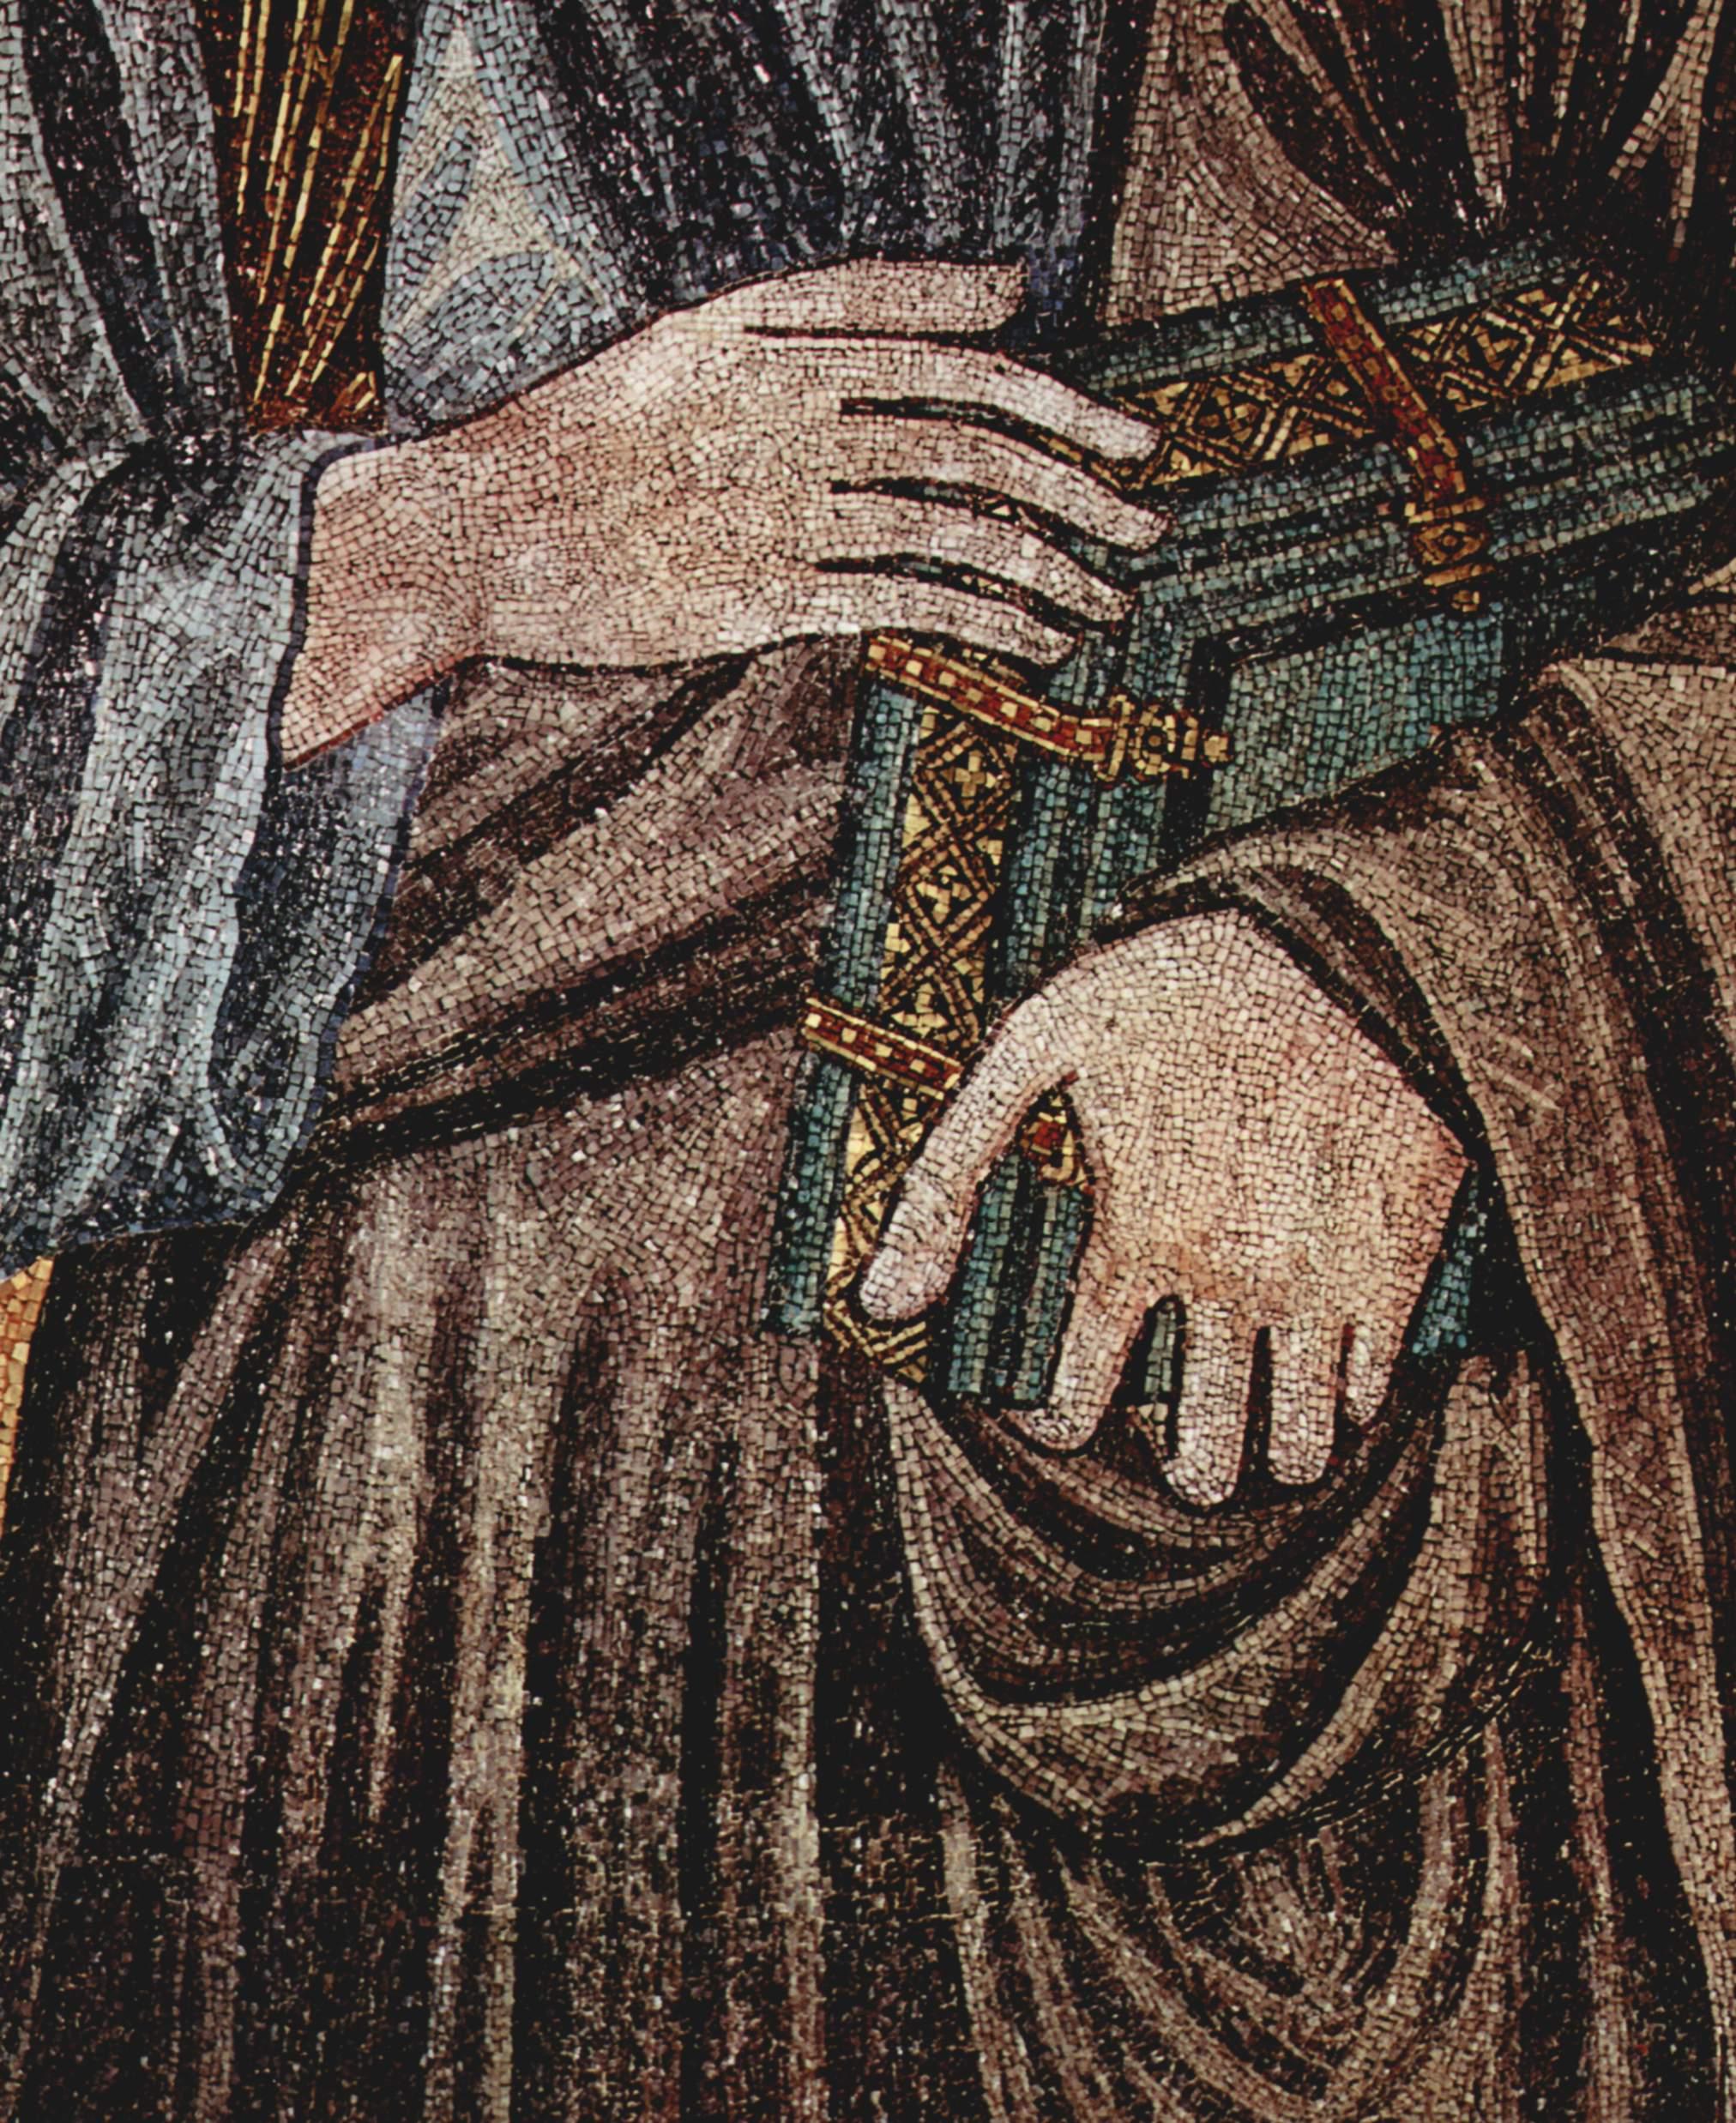 CIMABUE Christ Enthroned between the Virgin and St John the Evangelist (detail) 1301-02